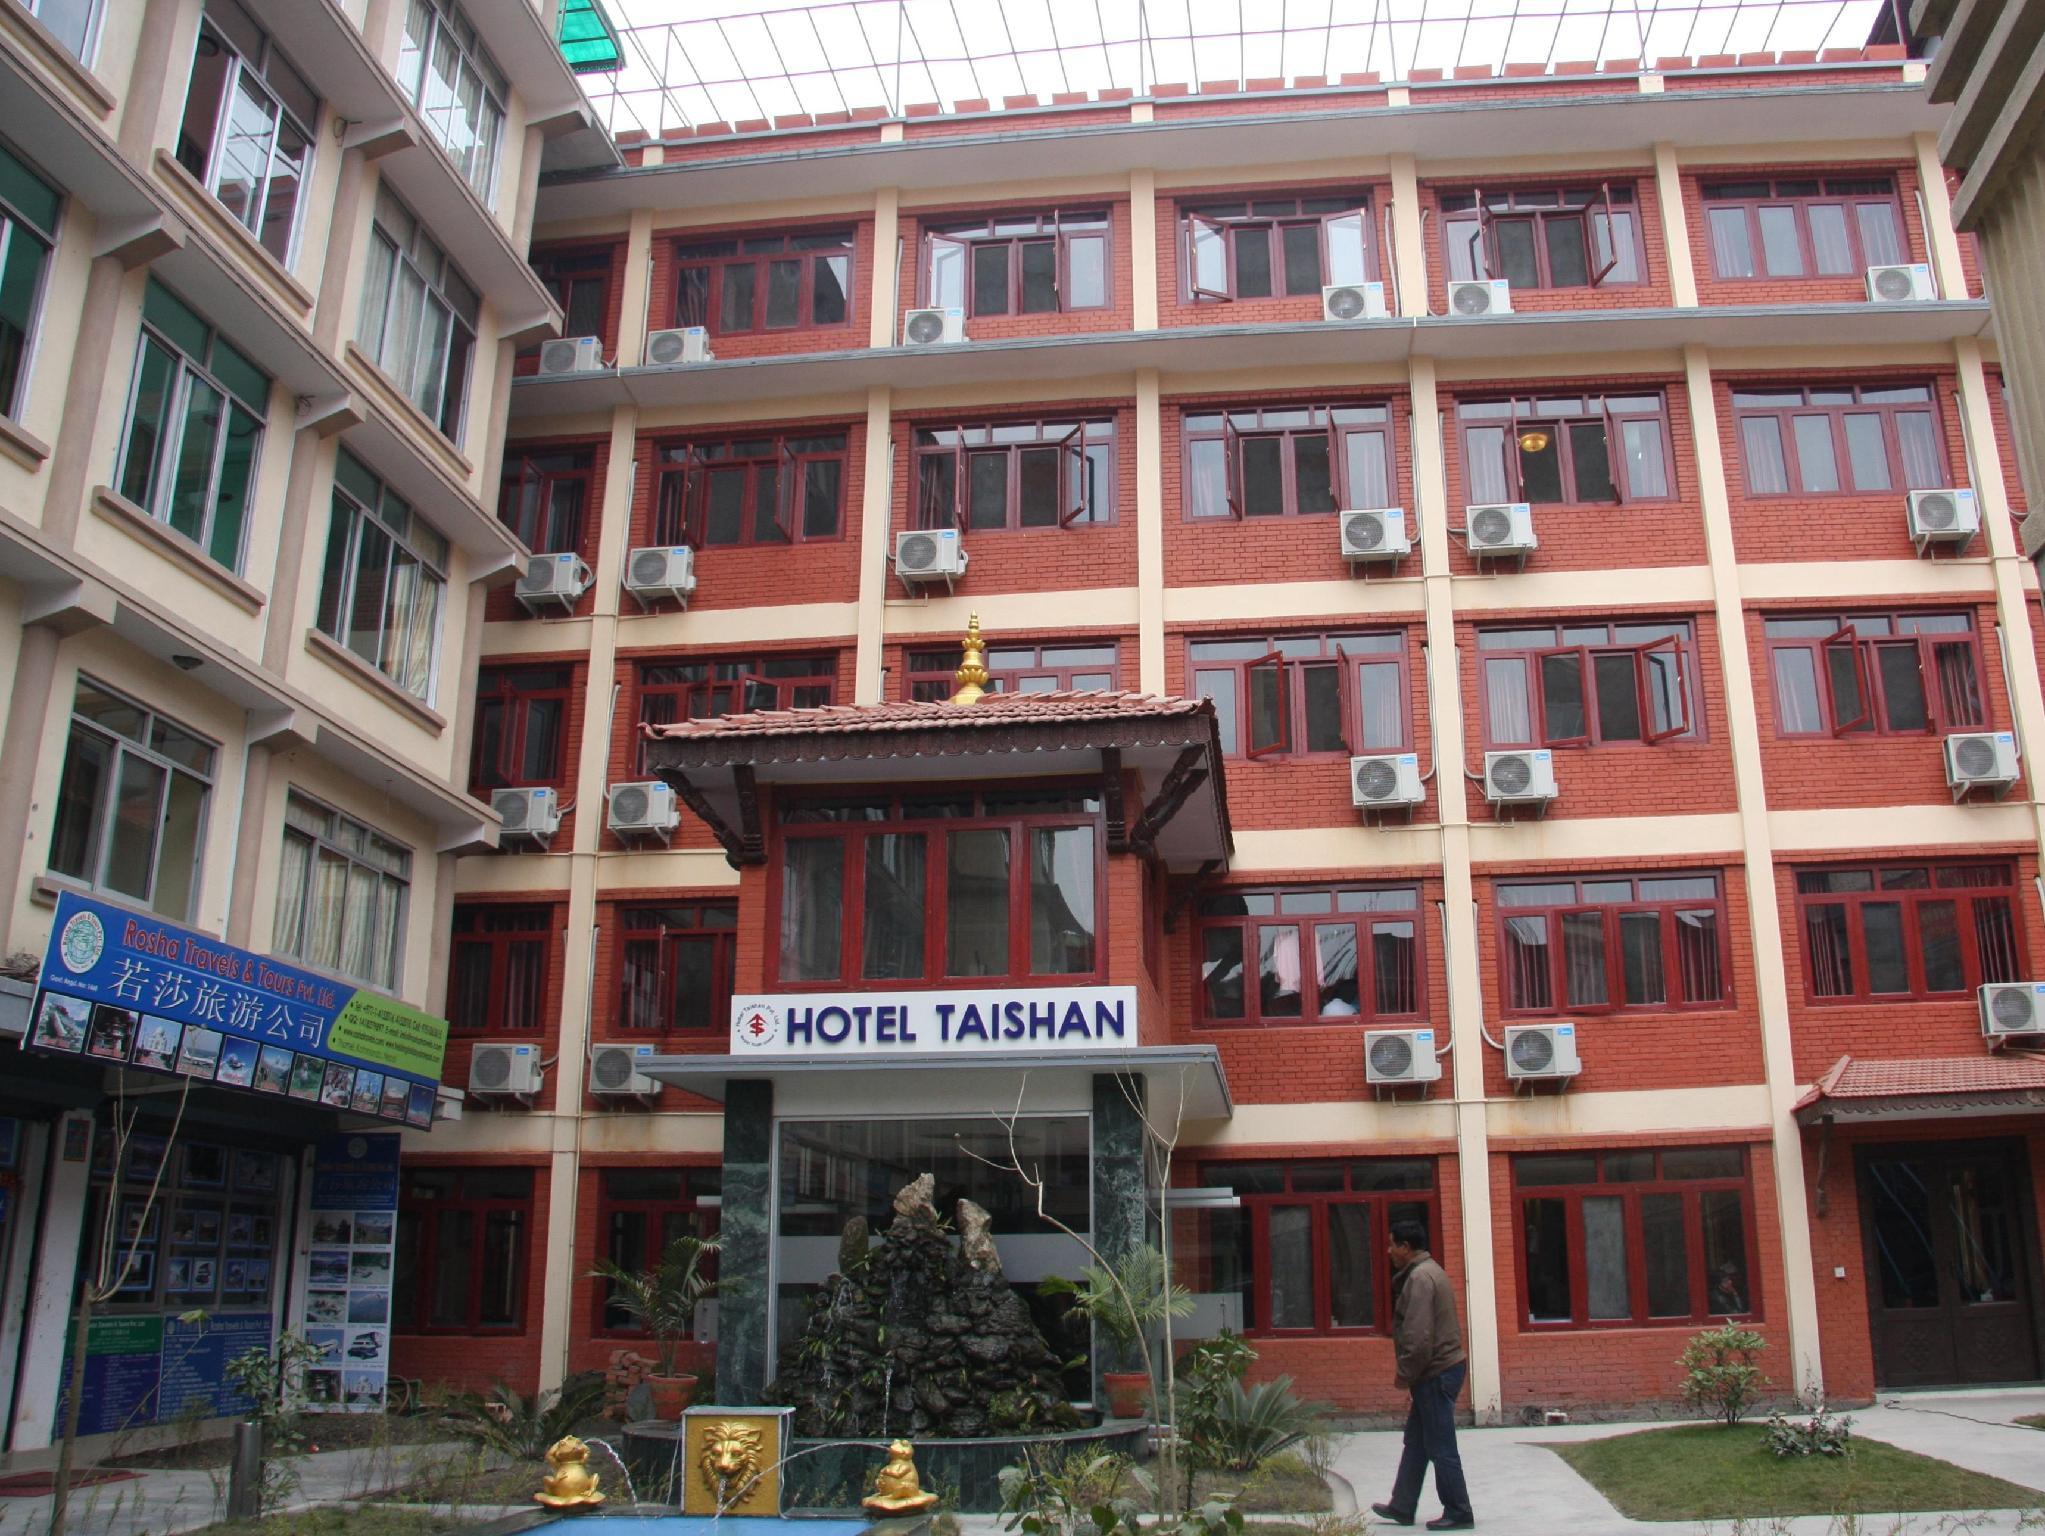 Hotel Taishan